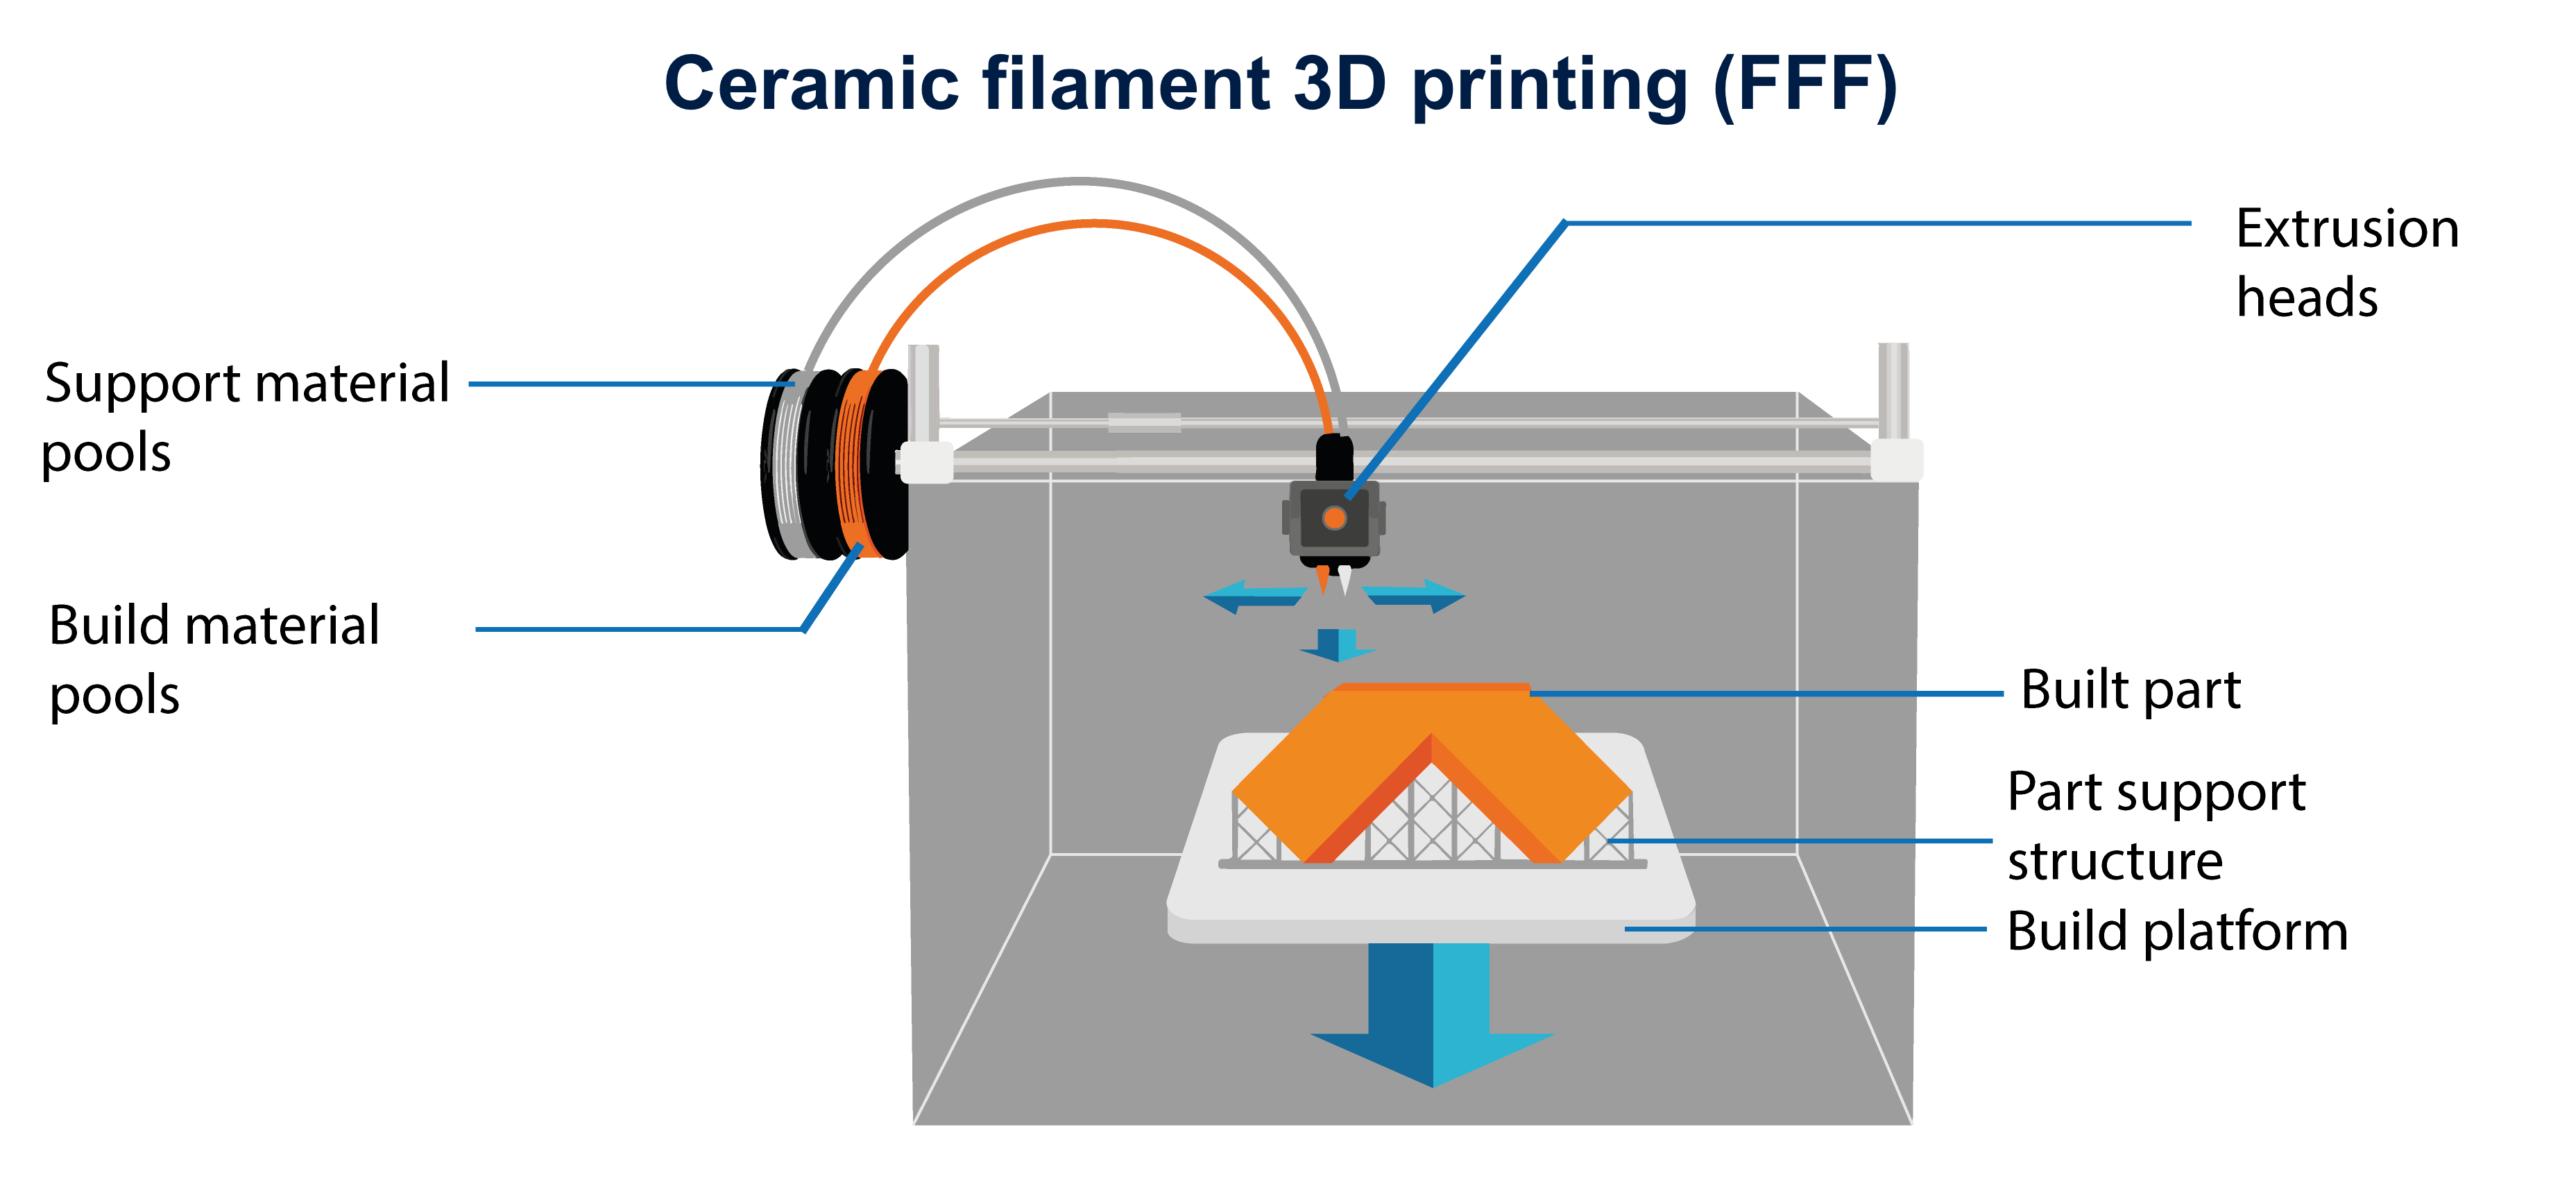 Ceramic filament FFF 3D printing